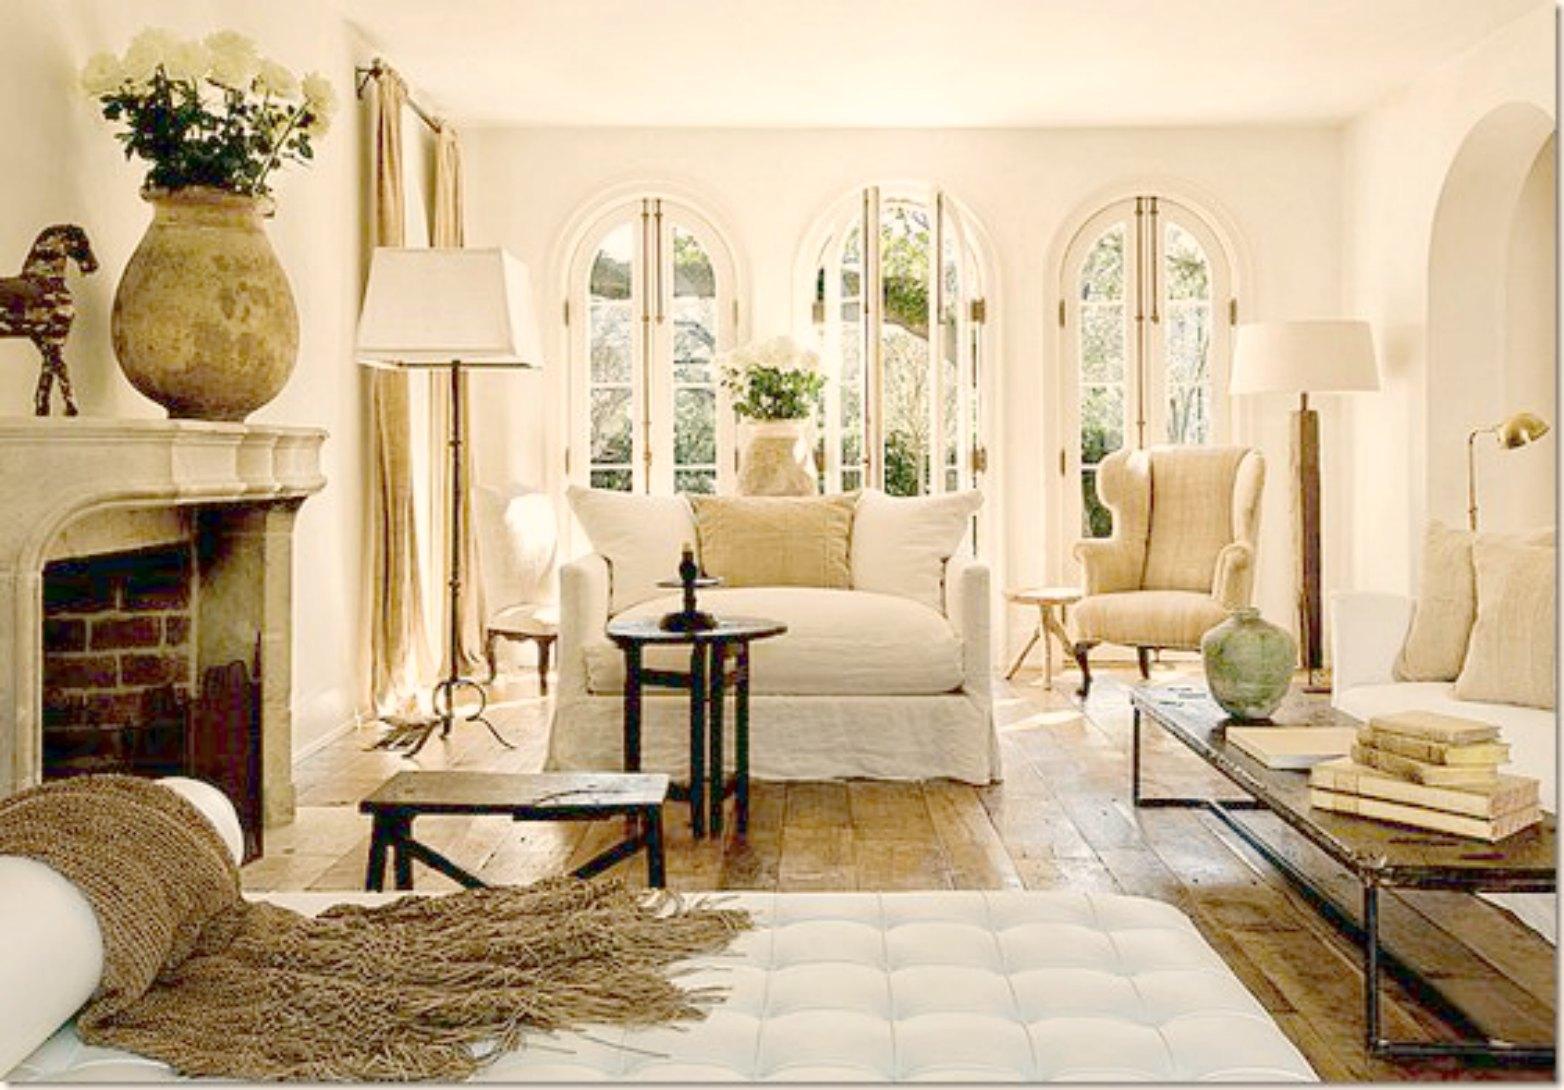 Pamela Pierce's French Country Decor & Timeless Style ...